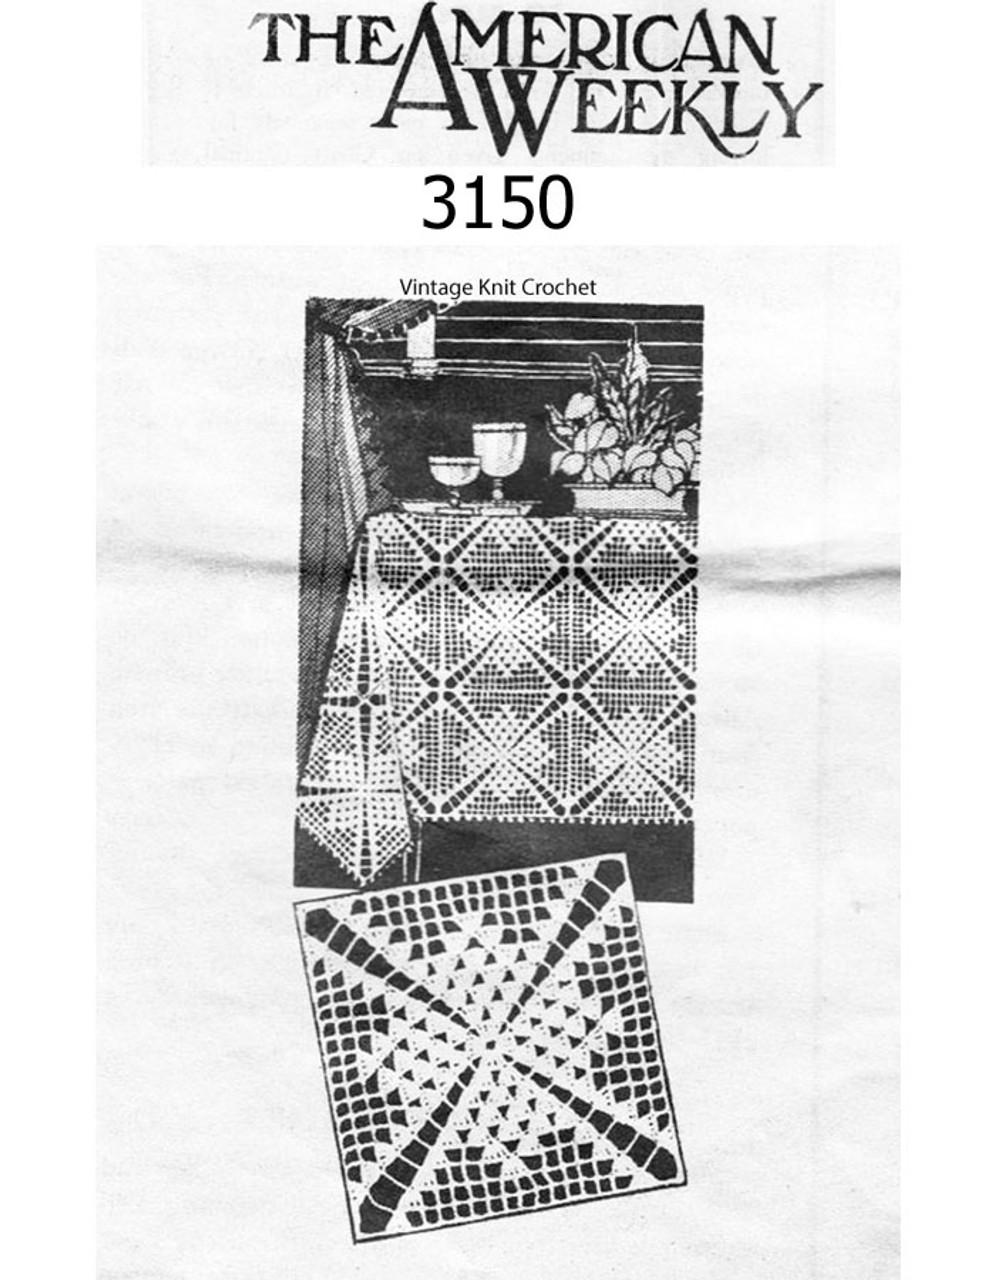 Vintage Crochet Scarf Square Pattern, Design 3150